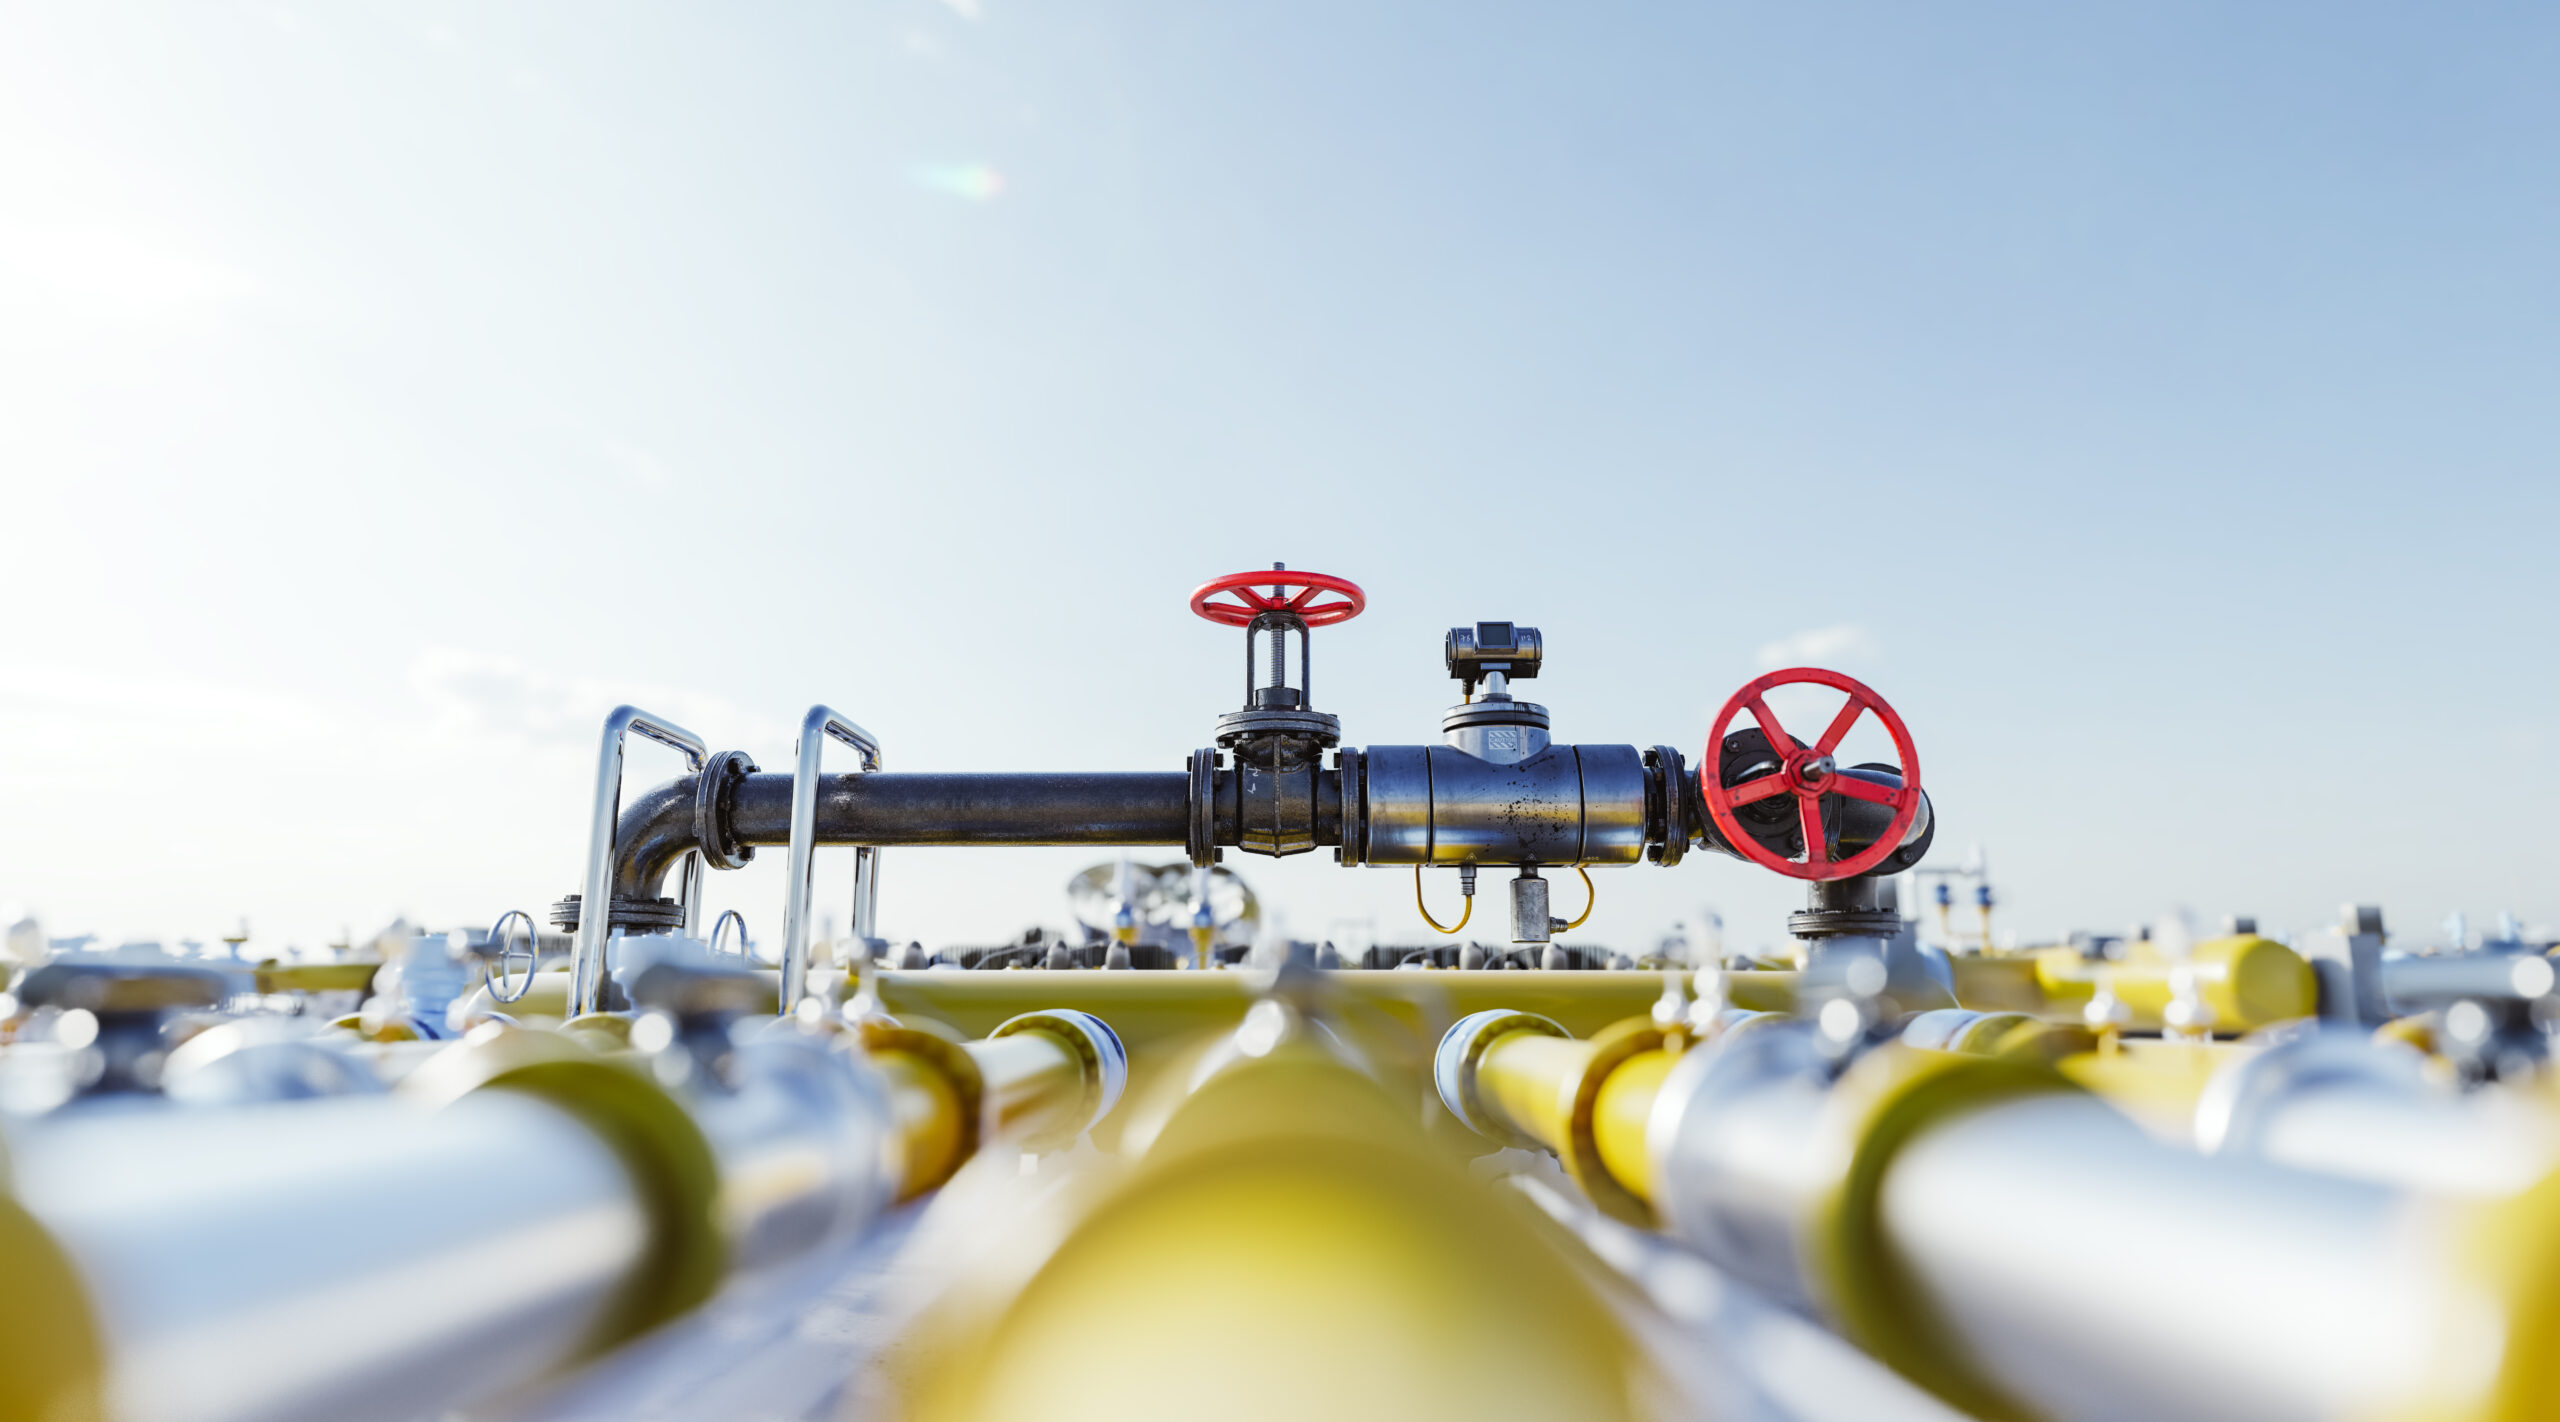 Hitting net zero 2050 – decarbonising the UK gas network